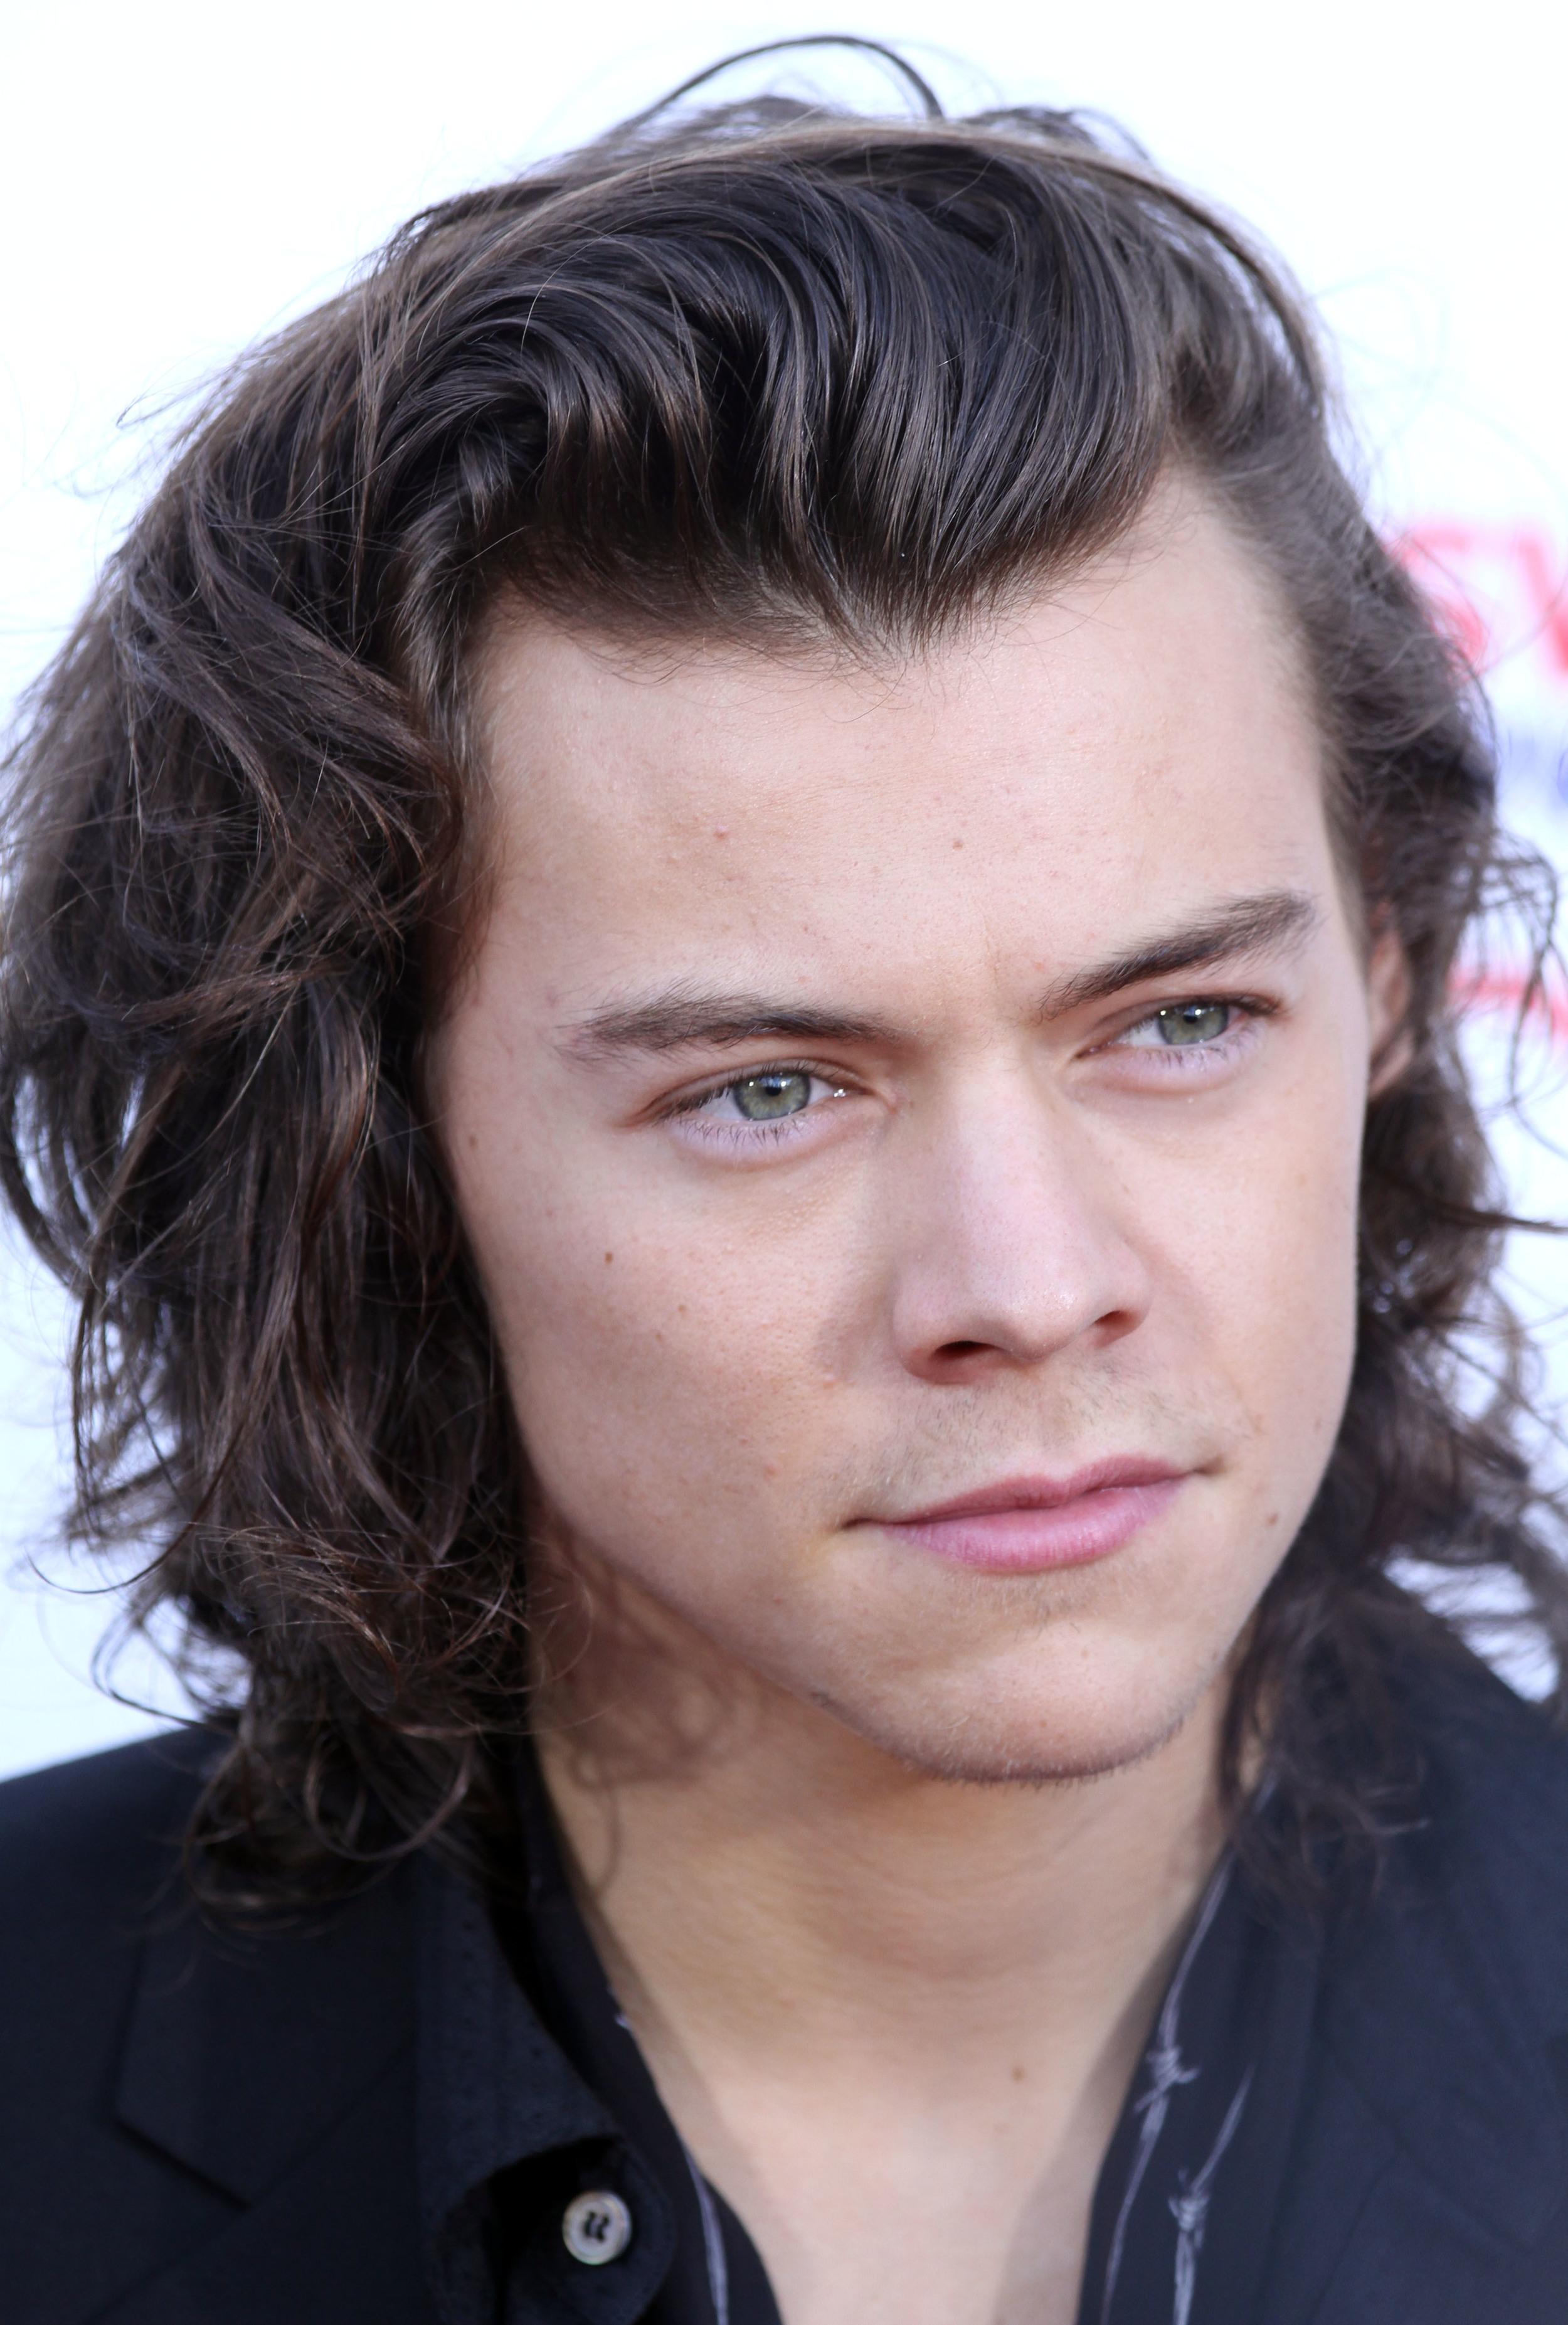 Harry_Styles_November_2014.jpg